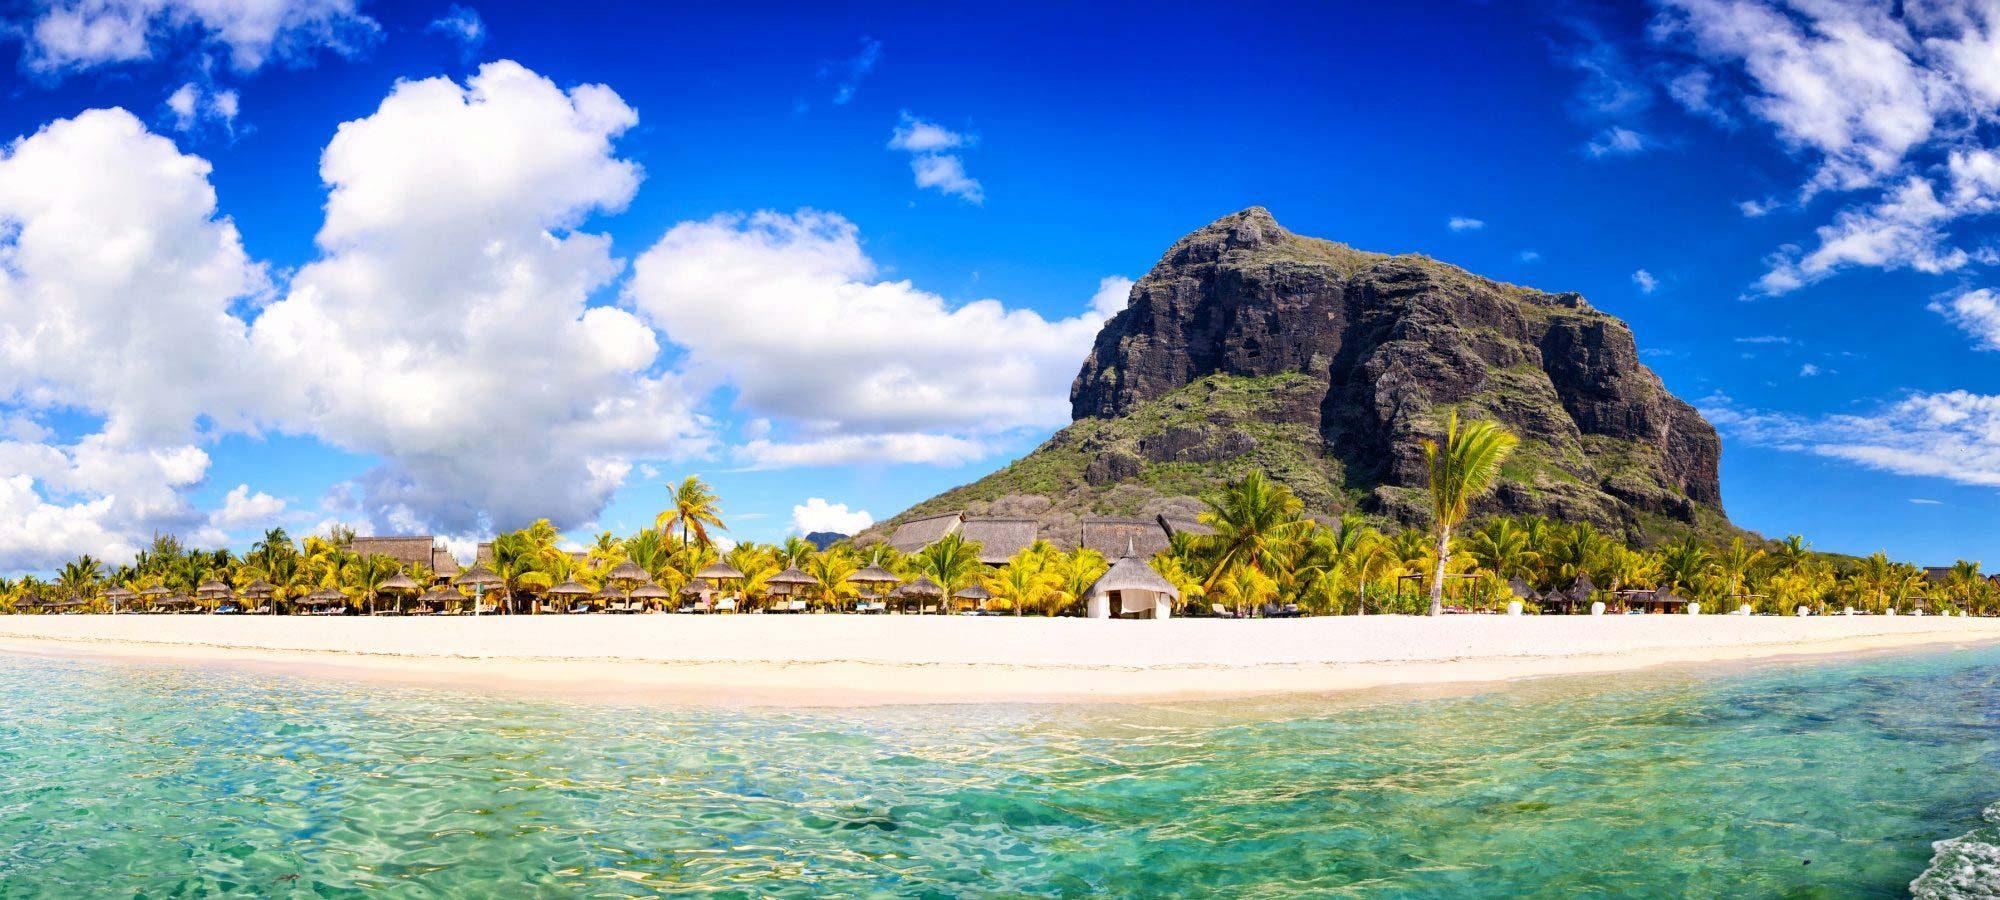 Le Morne Mauritius Beach